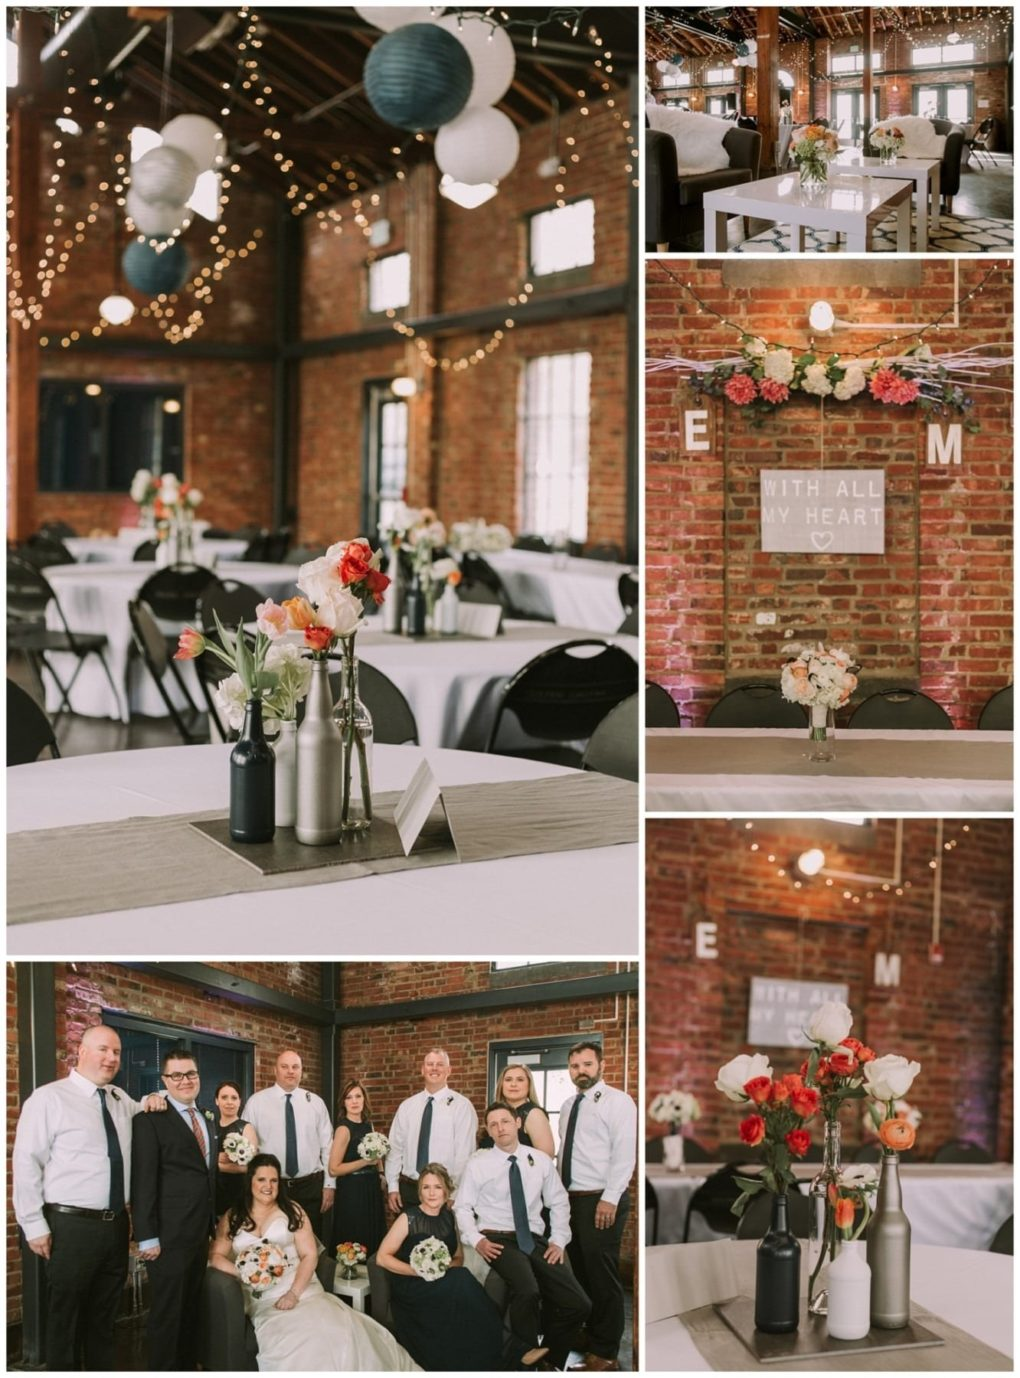 goldengardenswashingtonweddingvenues01 Seattle and Snohomish Wedding and Engagement Photography by GSquared Weddings Photography